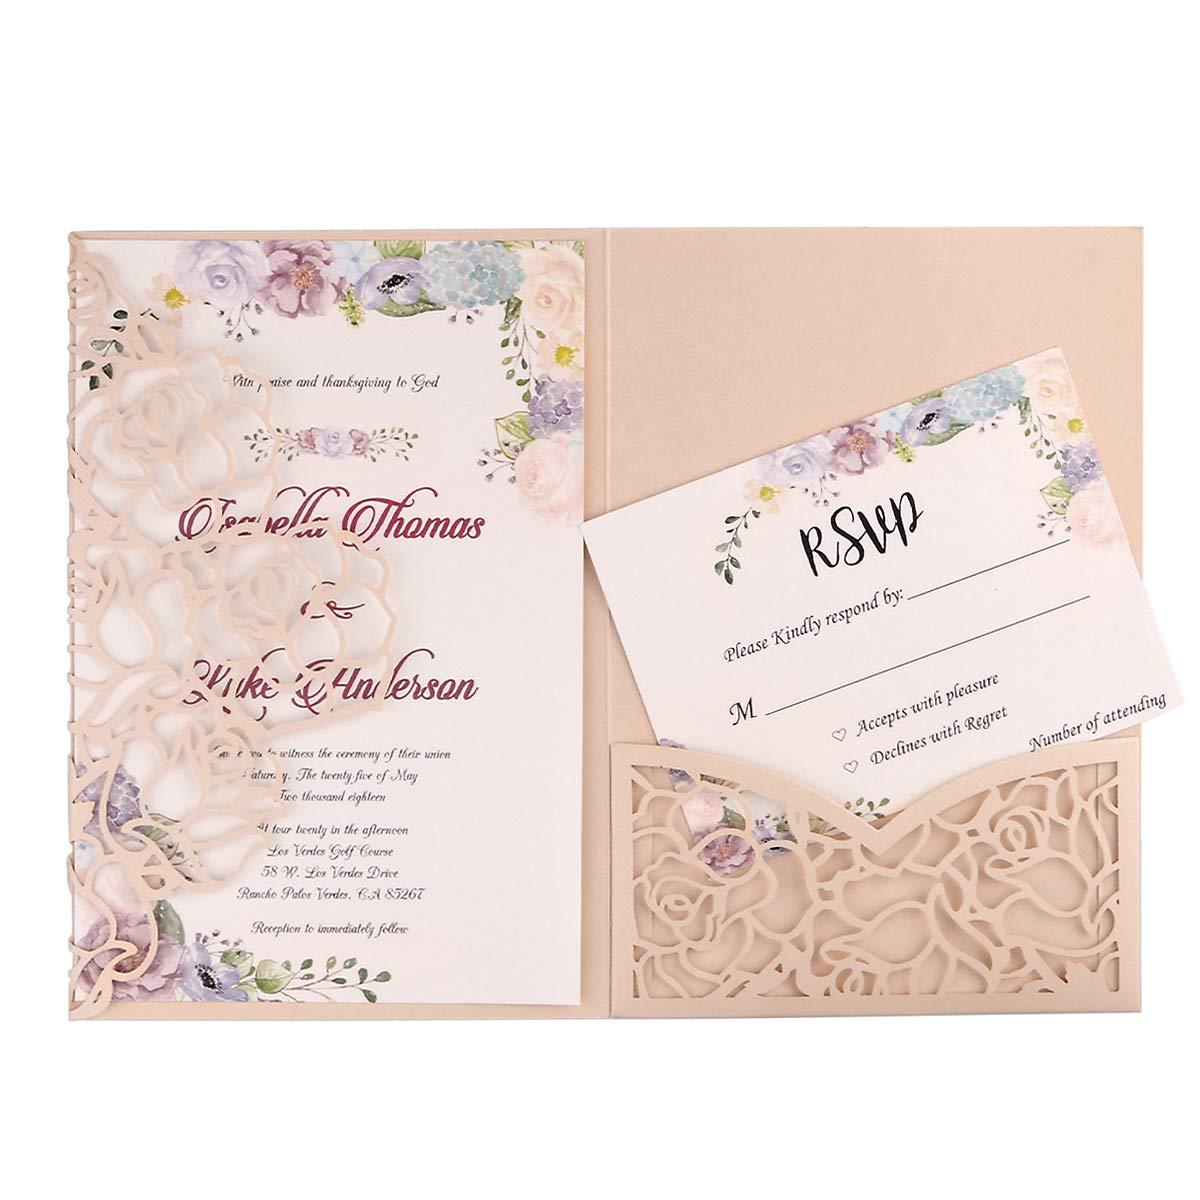 FEIYI 20 PCS 3 Folds Laser Cut Rose Shape Wedding Invitations Cards for Wedding Bridal Shower Engagement Birthday Graduation Invitation Cards (Blush ...